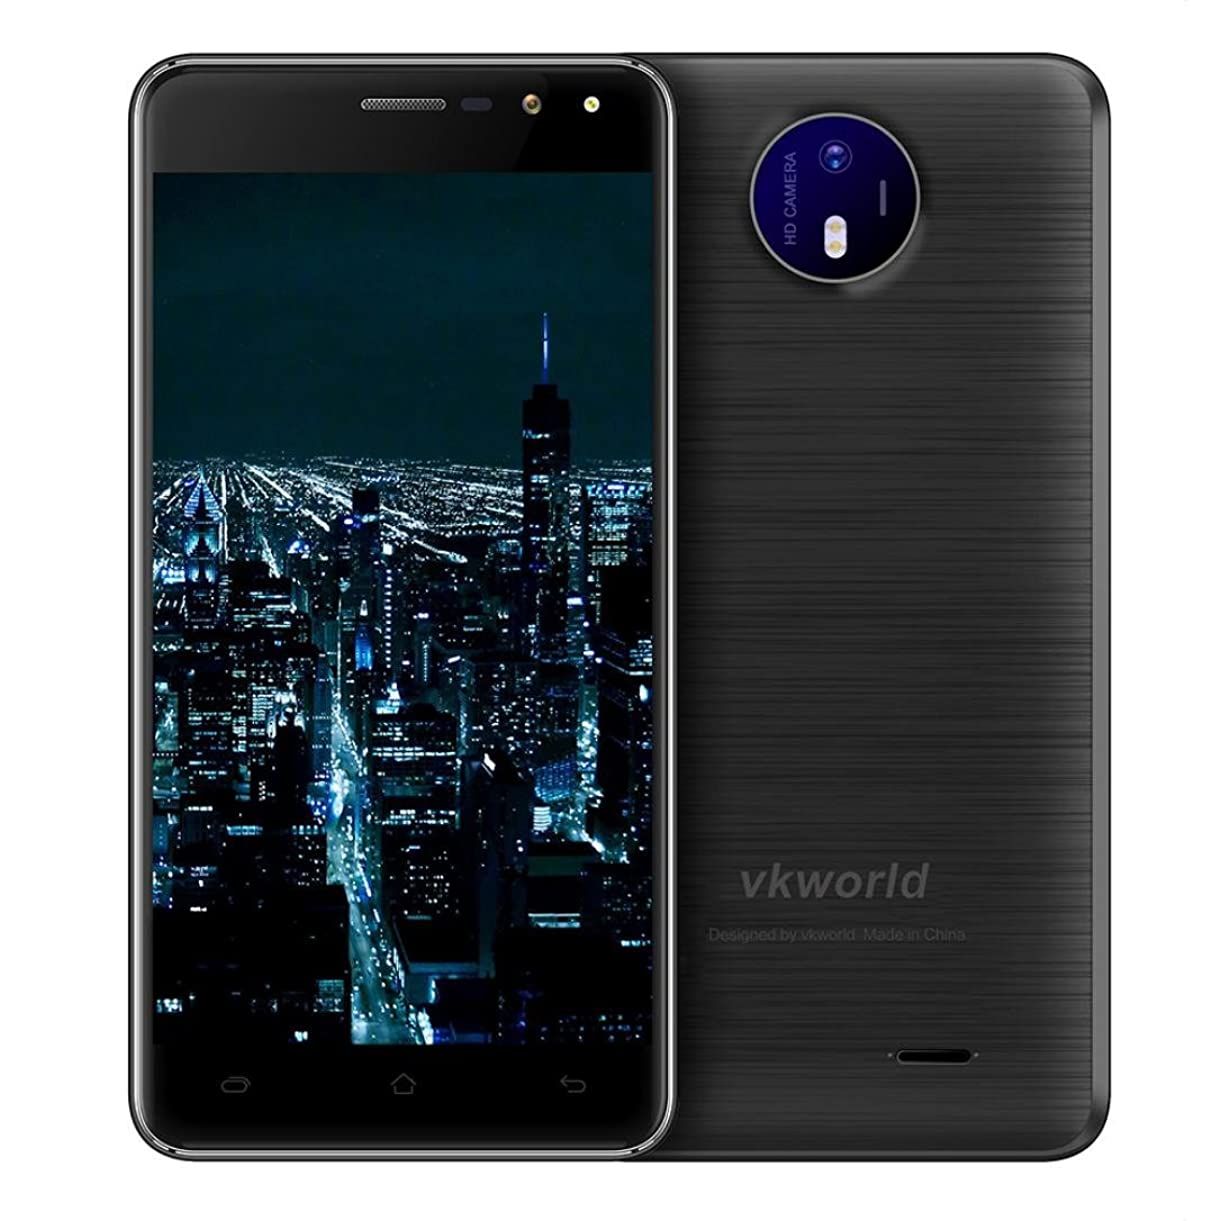 Hotsale!Elevin(TM)2017New VKworld F2 3G Unlocked Smartphone 5.0 inch 2.5D Arc Screen Android 6.0 MTK6580A Quad Core 1.3GHz 2GB RAM 16GB ROM Dual Flash Light US Plug (Black) rkgry2534